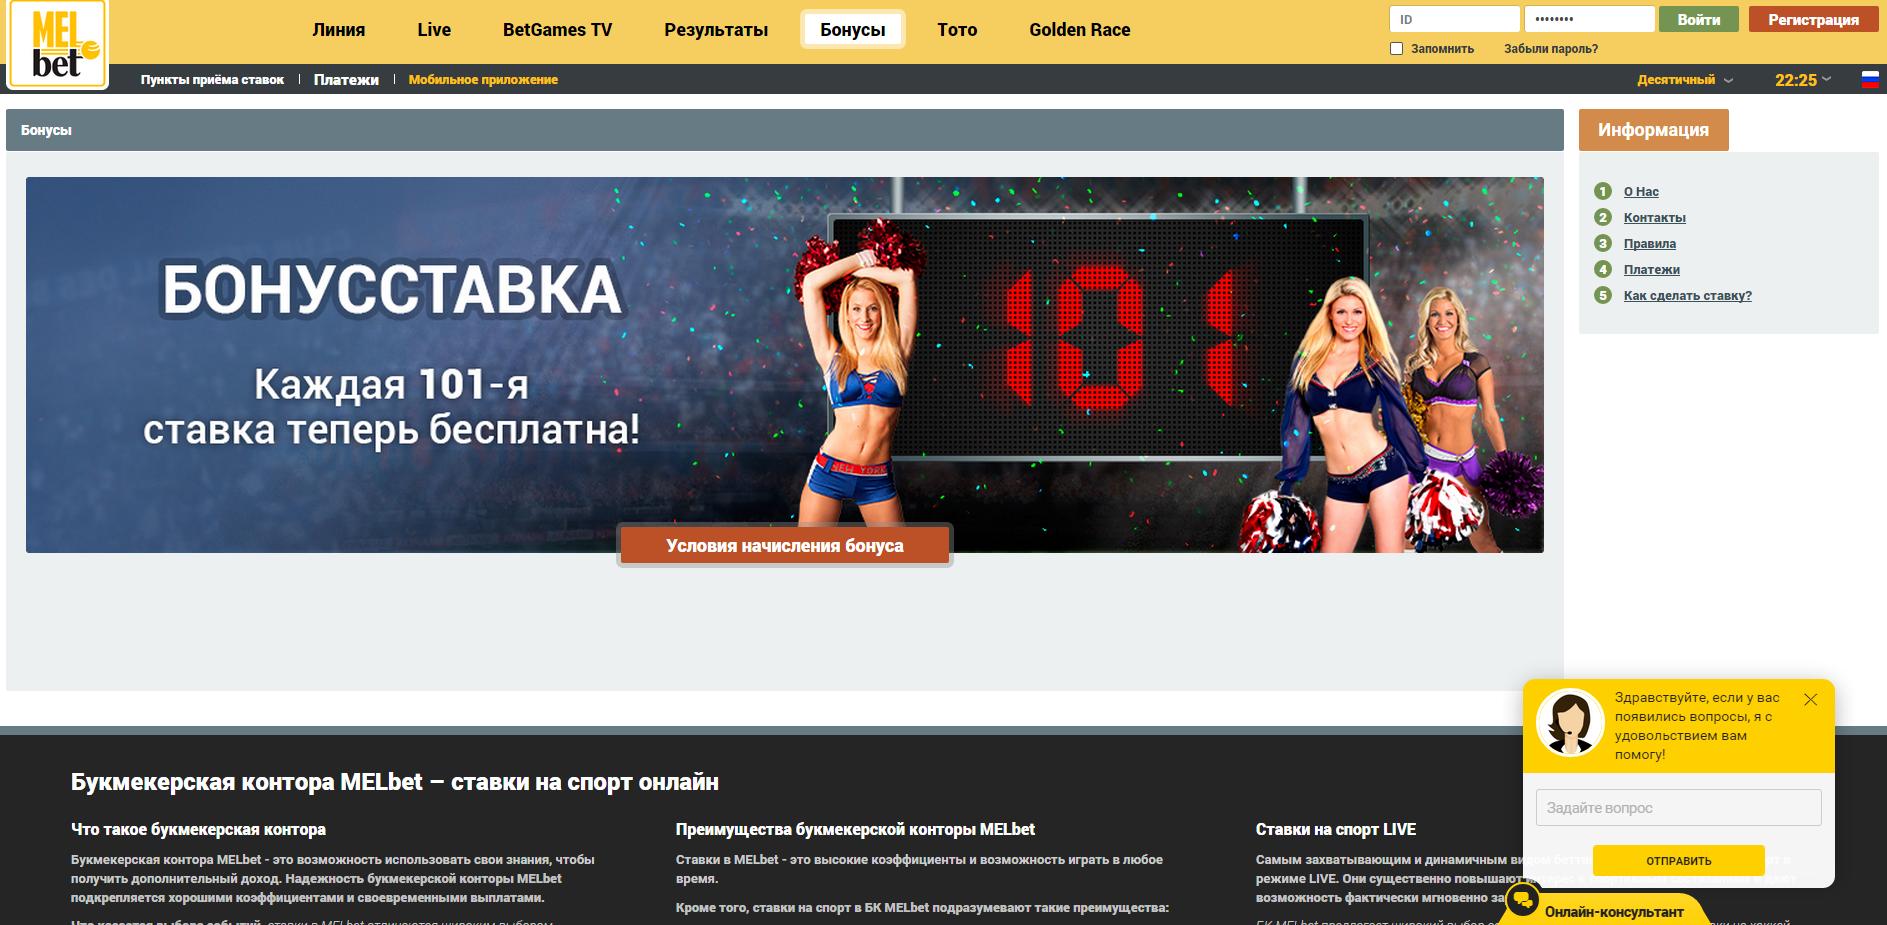 Ставки на спорт - 888poker - Форум PokerStrategycom